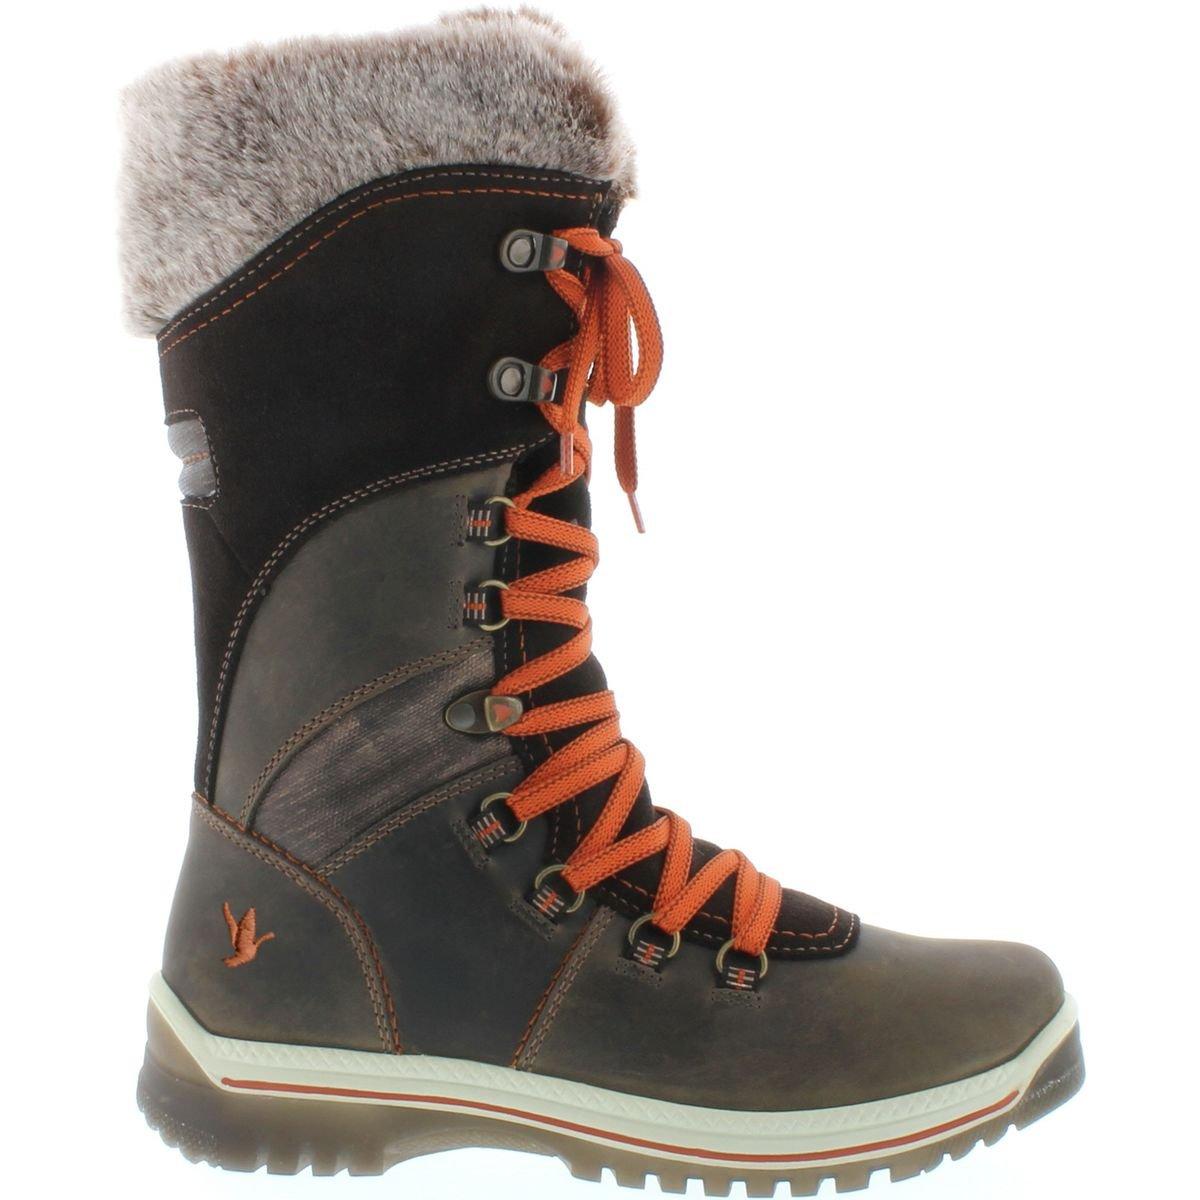 Santana Canada Women's Morella Winter Boot B076P27WD7 9 B(M) US|Brown